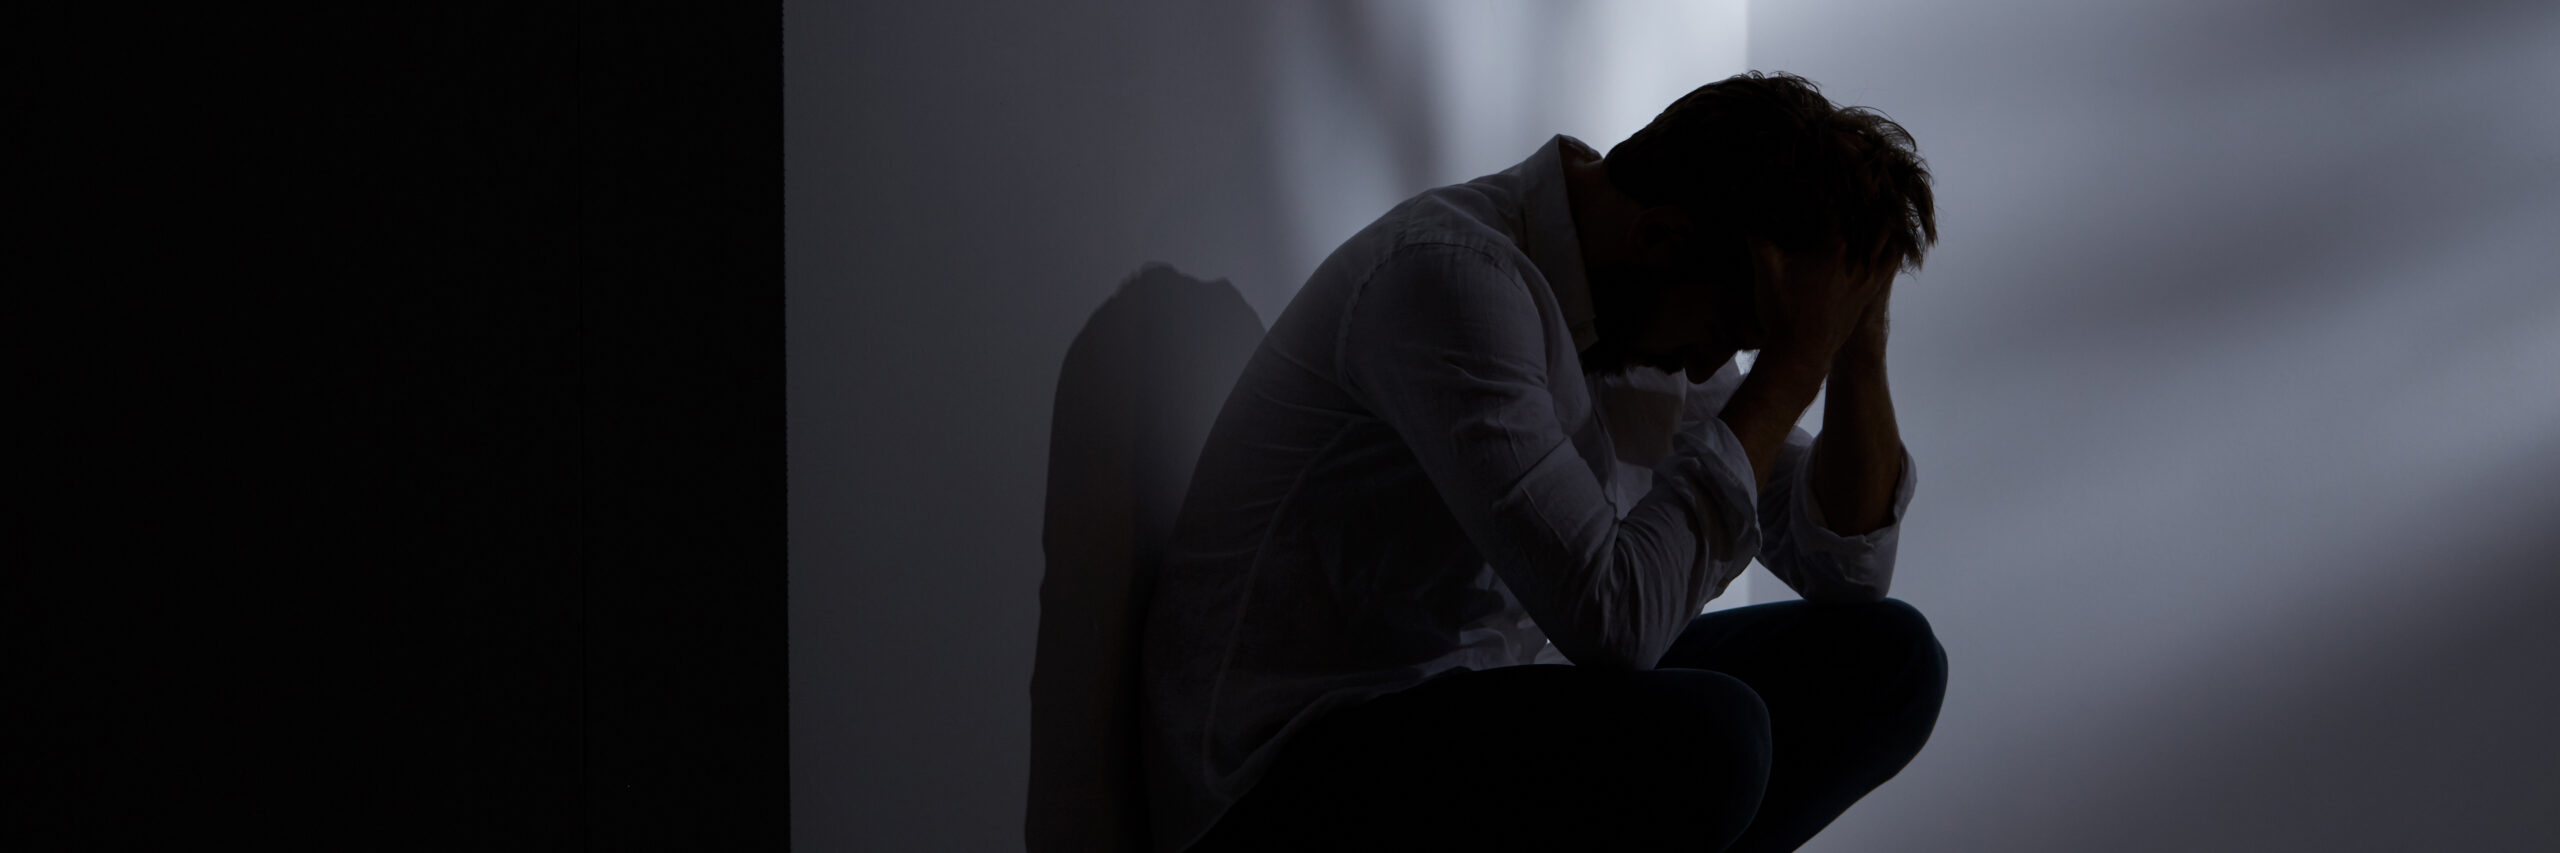 OCD, Scrupulosity, and the Journey of Faith